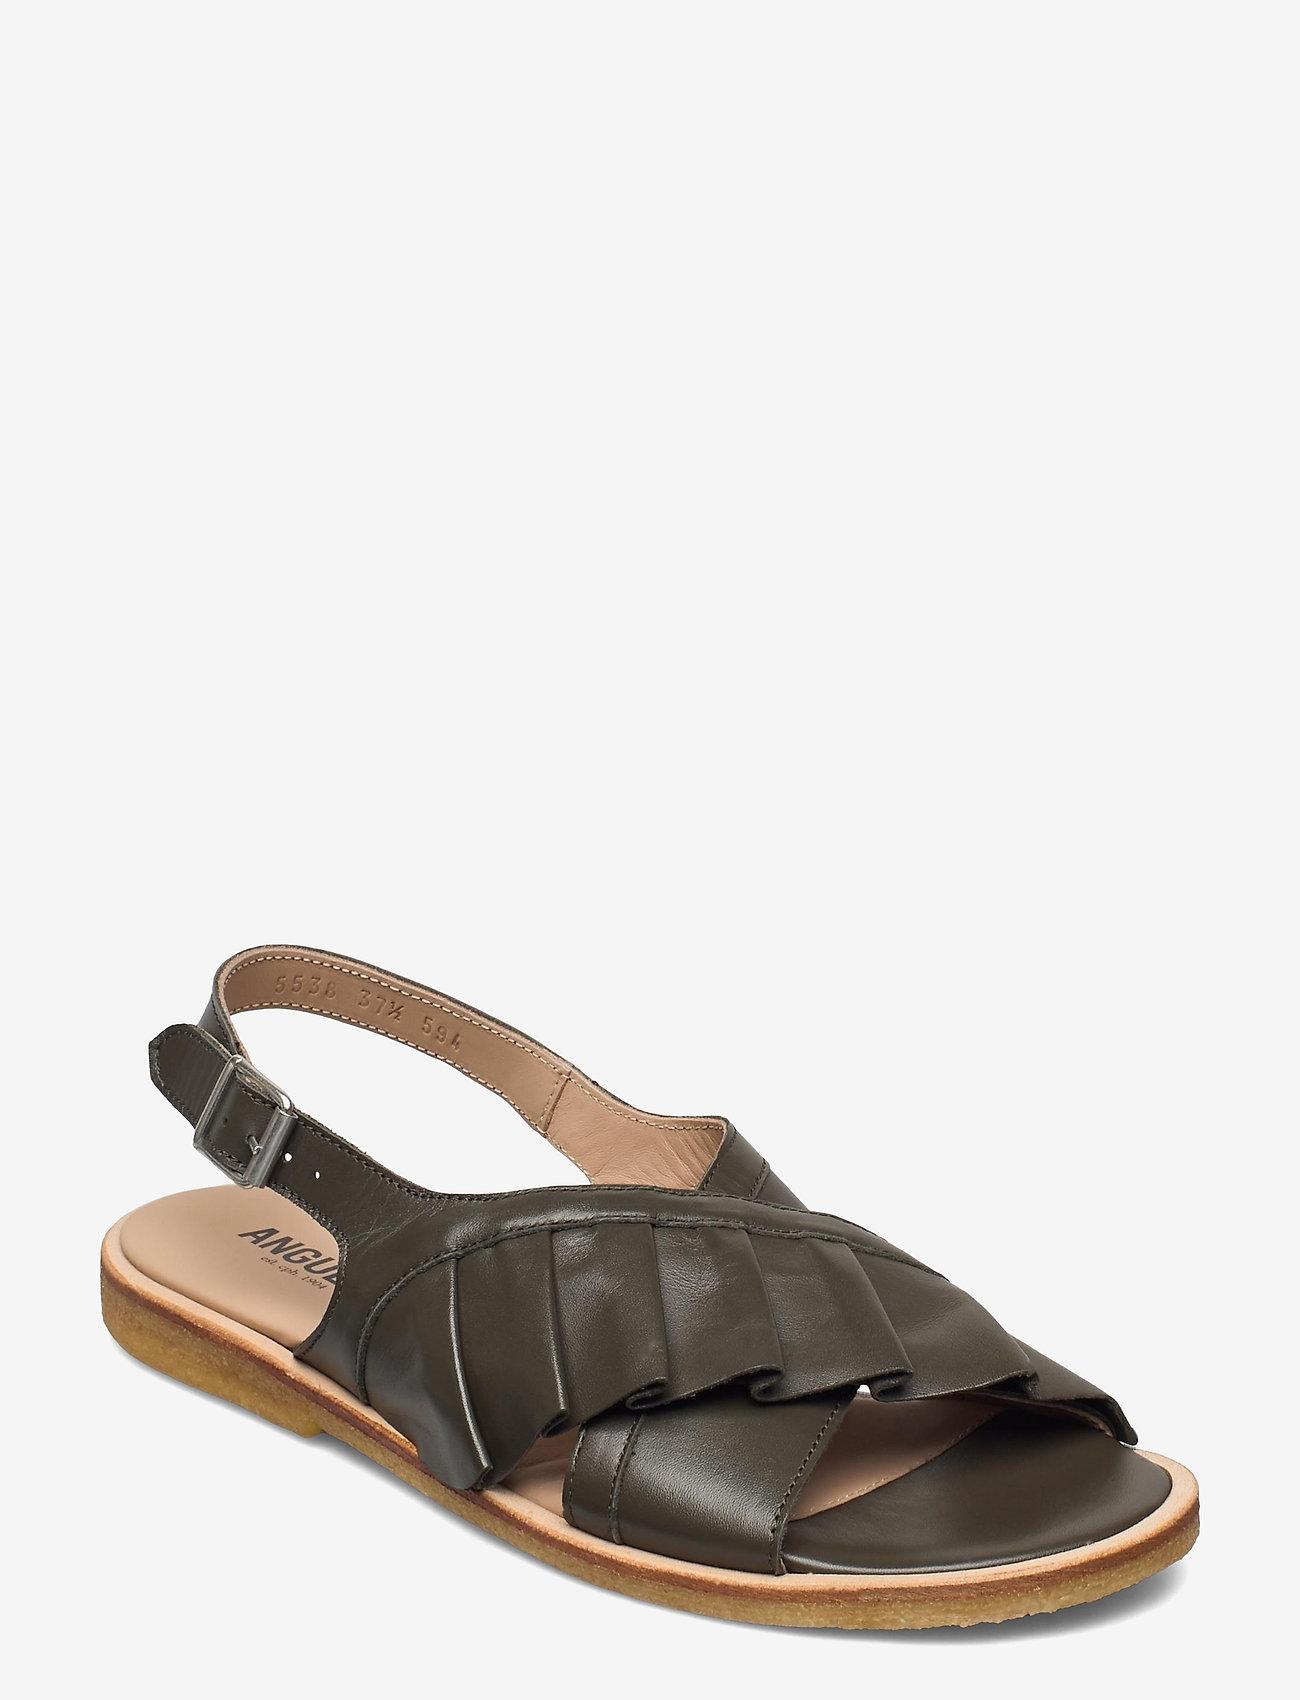 ANGULUS - Sandals - flat - flache sandalen - 1446 olive - 0